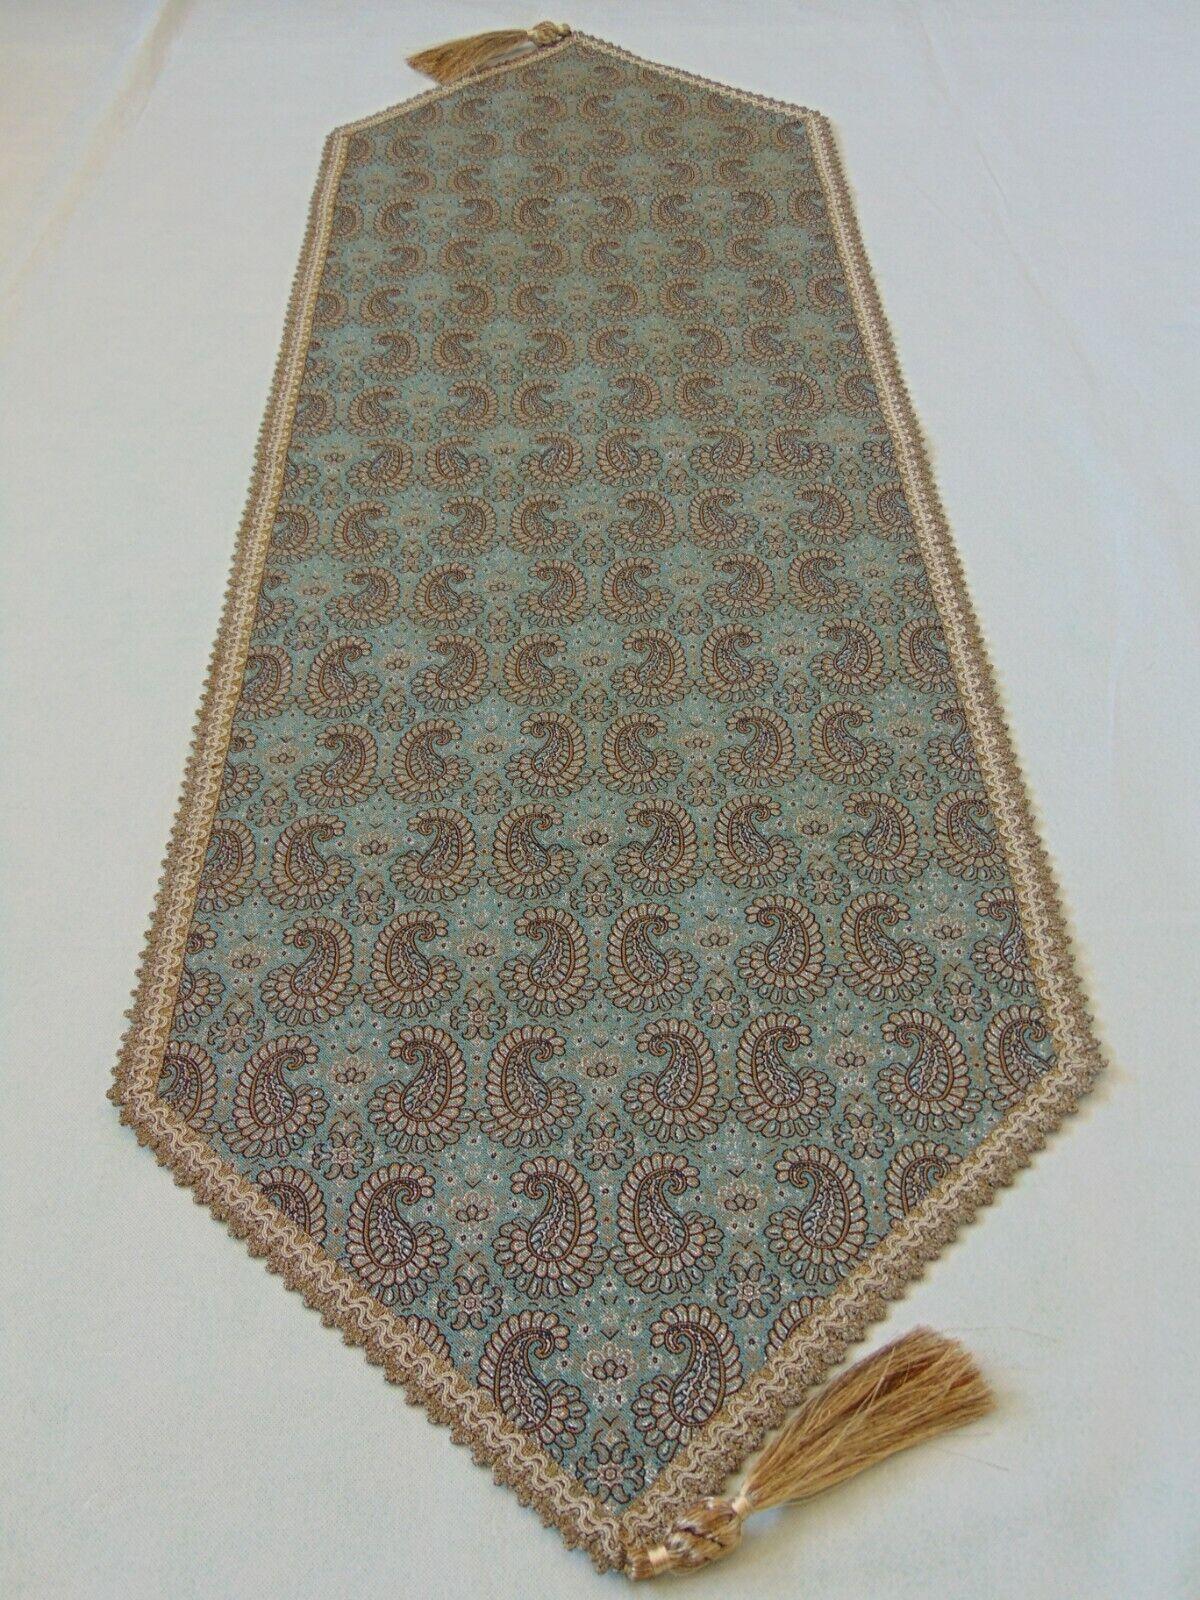 Persian art silk tapestry woven paisley rug pattern Termeh tablecloth runner